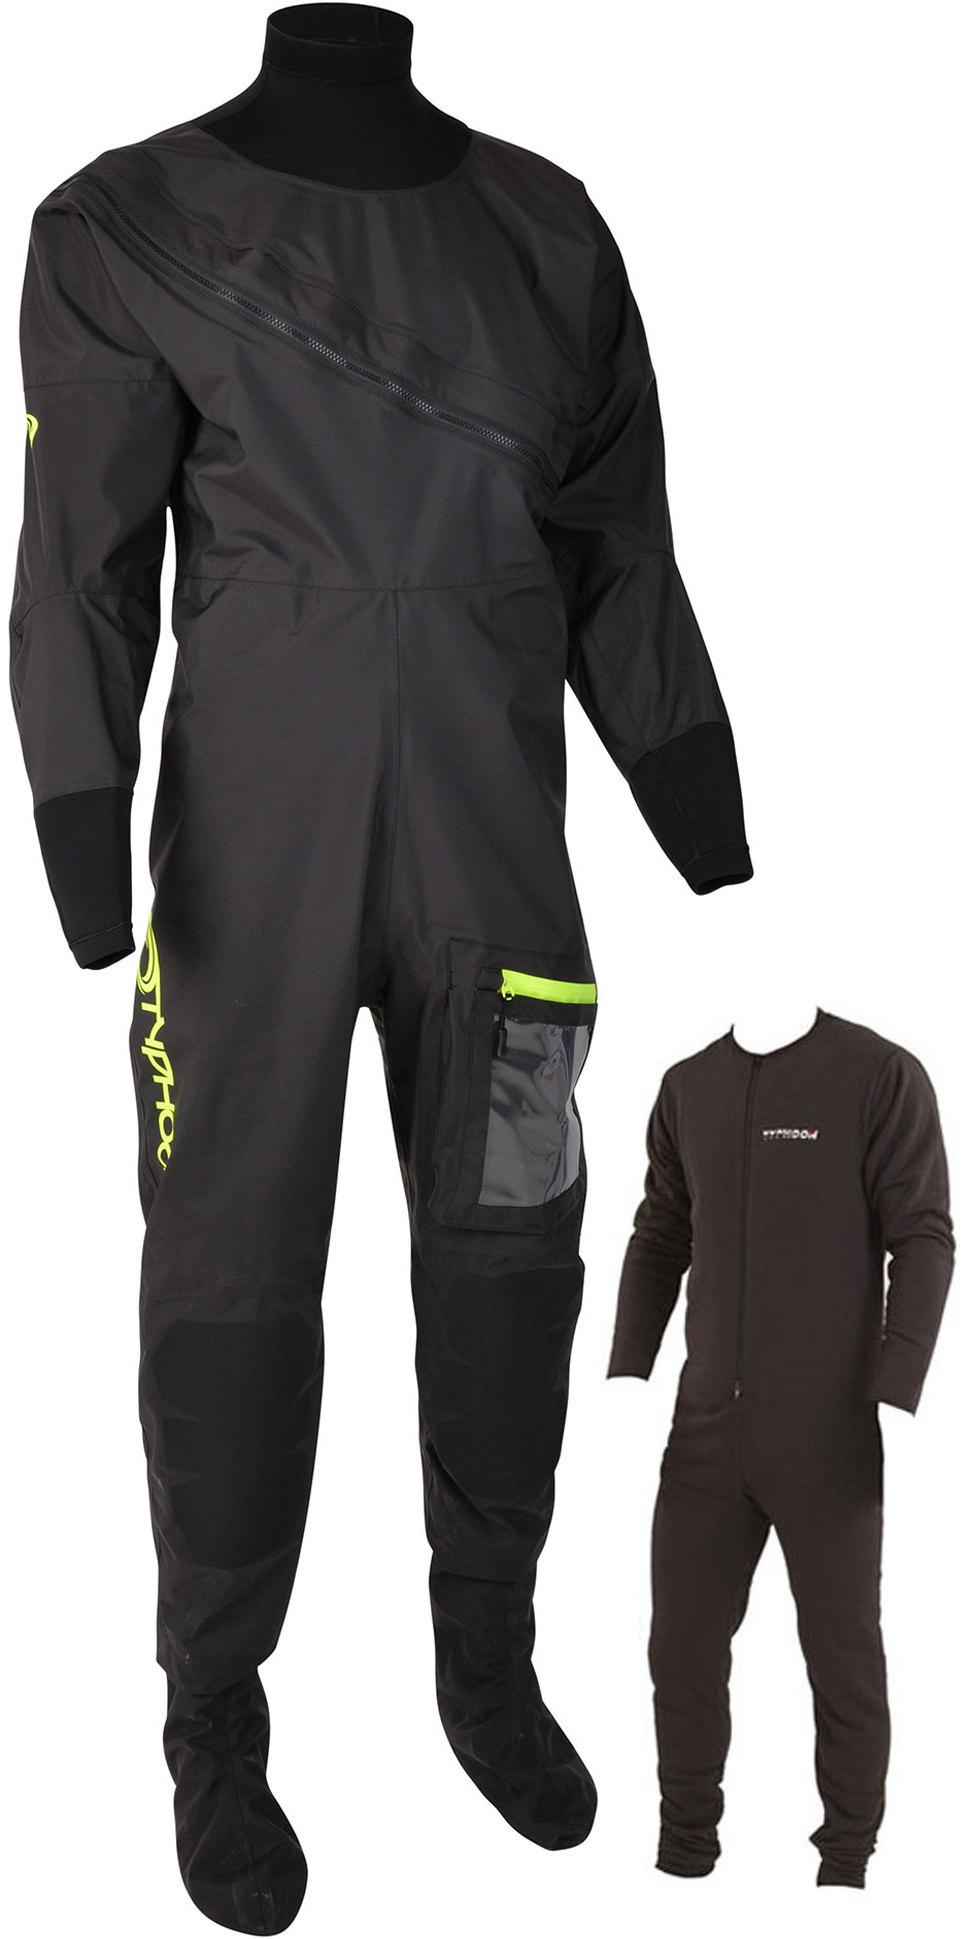 2019 Typhoon Mens Ezeedon 4 Front Zip Drysuit & Free Underfleece 100174 - Black